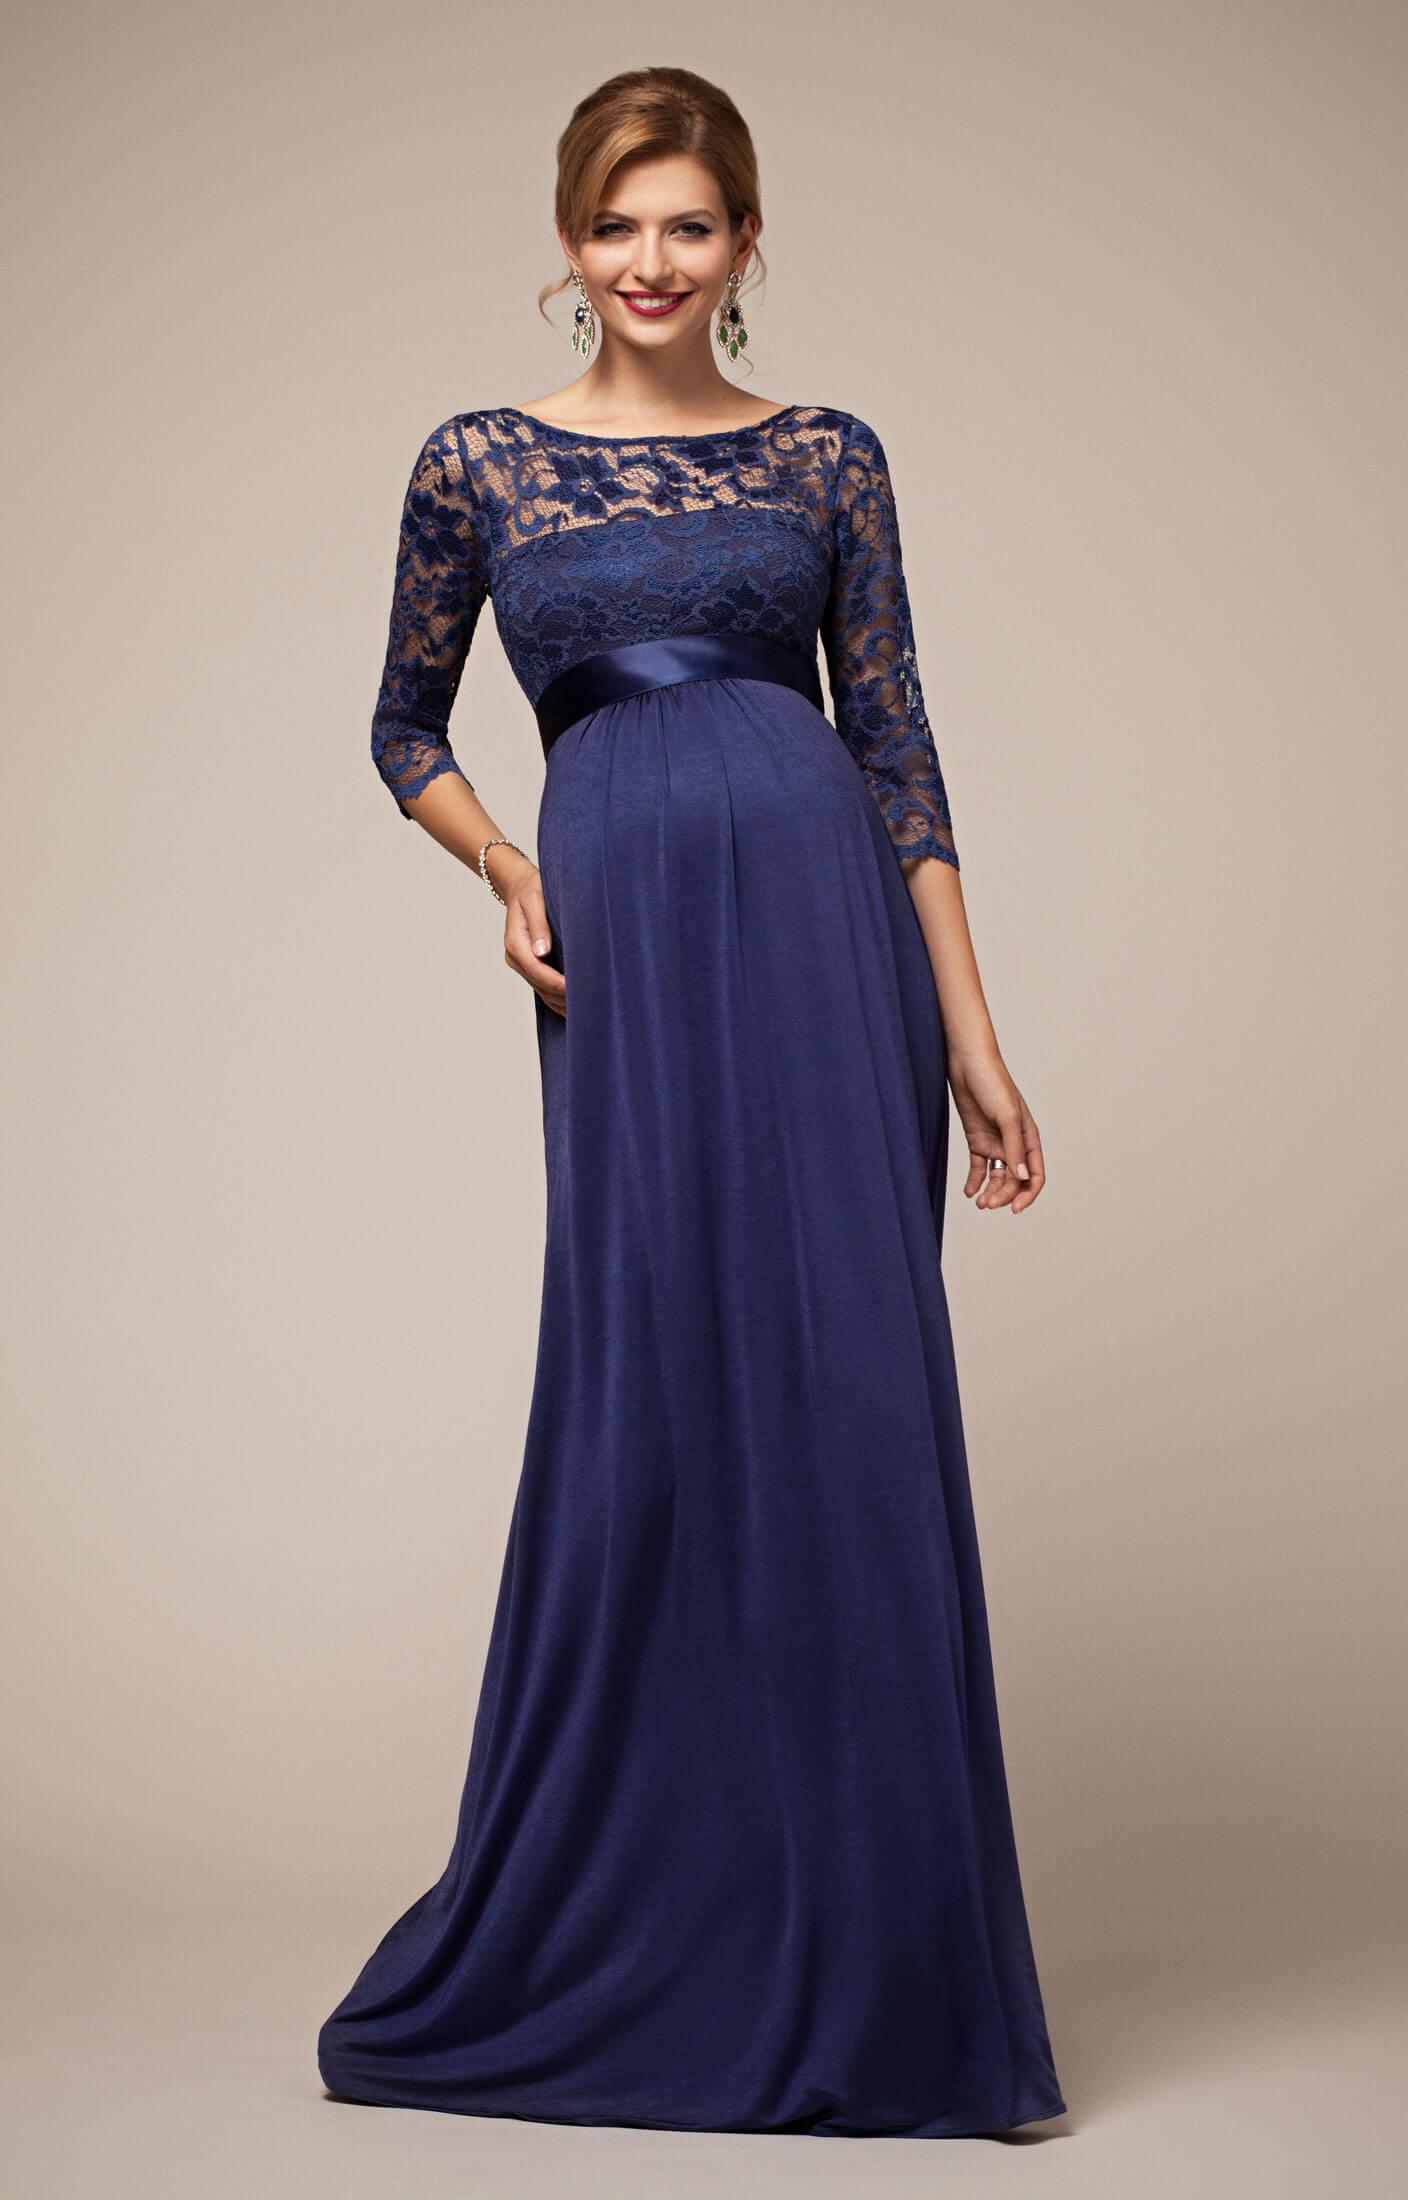 Lucia Maternity Gown Windsor Blue wedding dresses with blue Lucia Maternity Gown Windsor Blue by Tiffany Rose